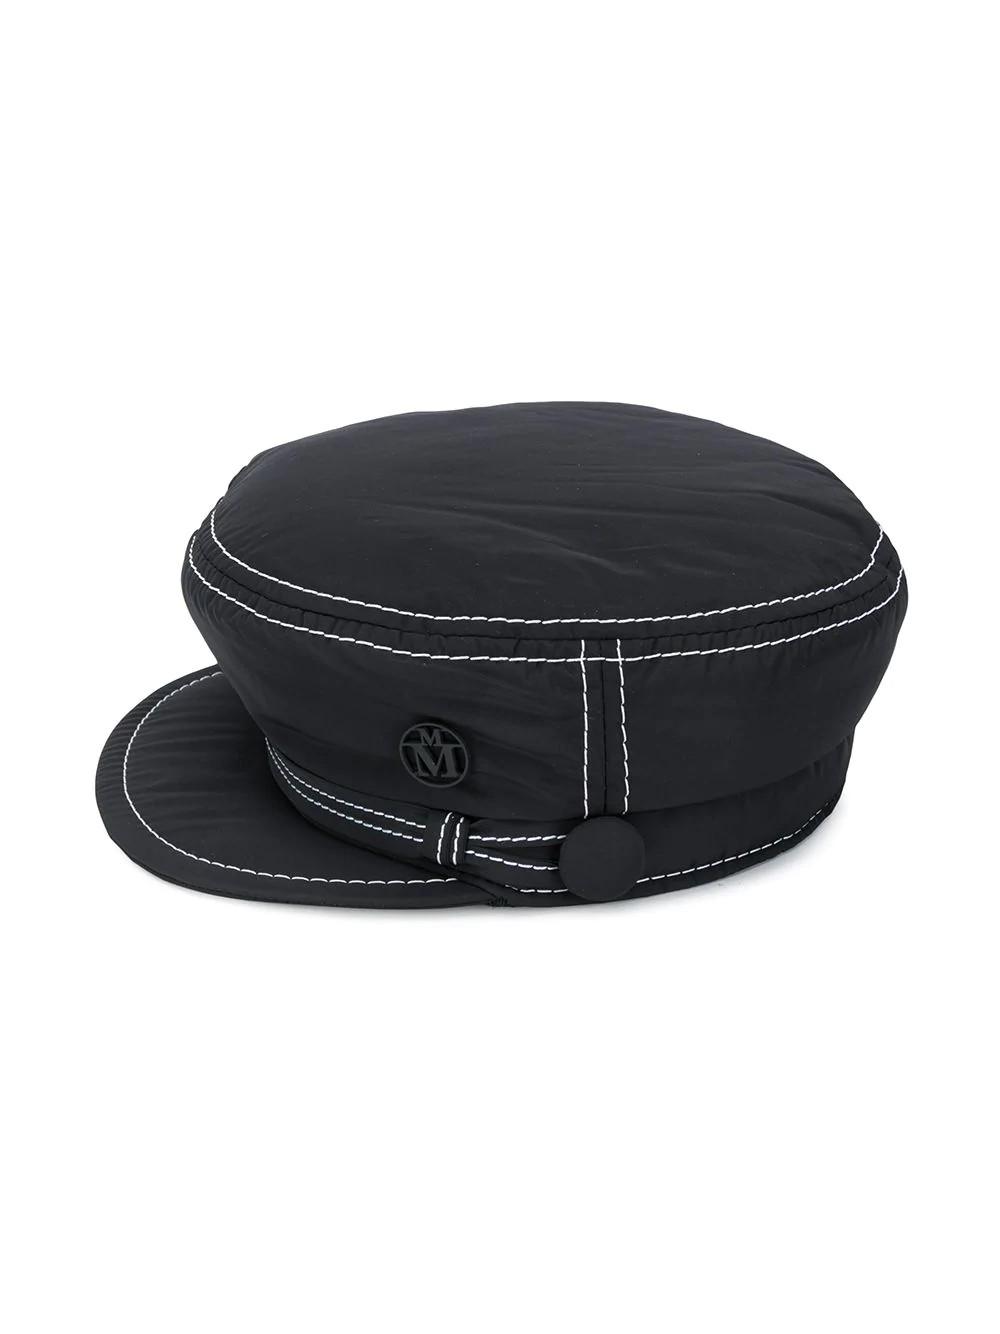 SOFT NEW ABBY HAT2 20PF TOPSTITCHED NYLON